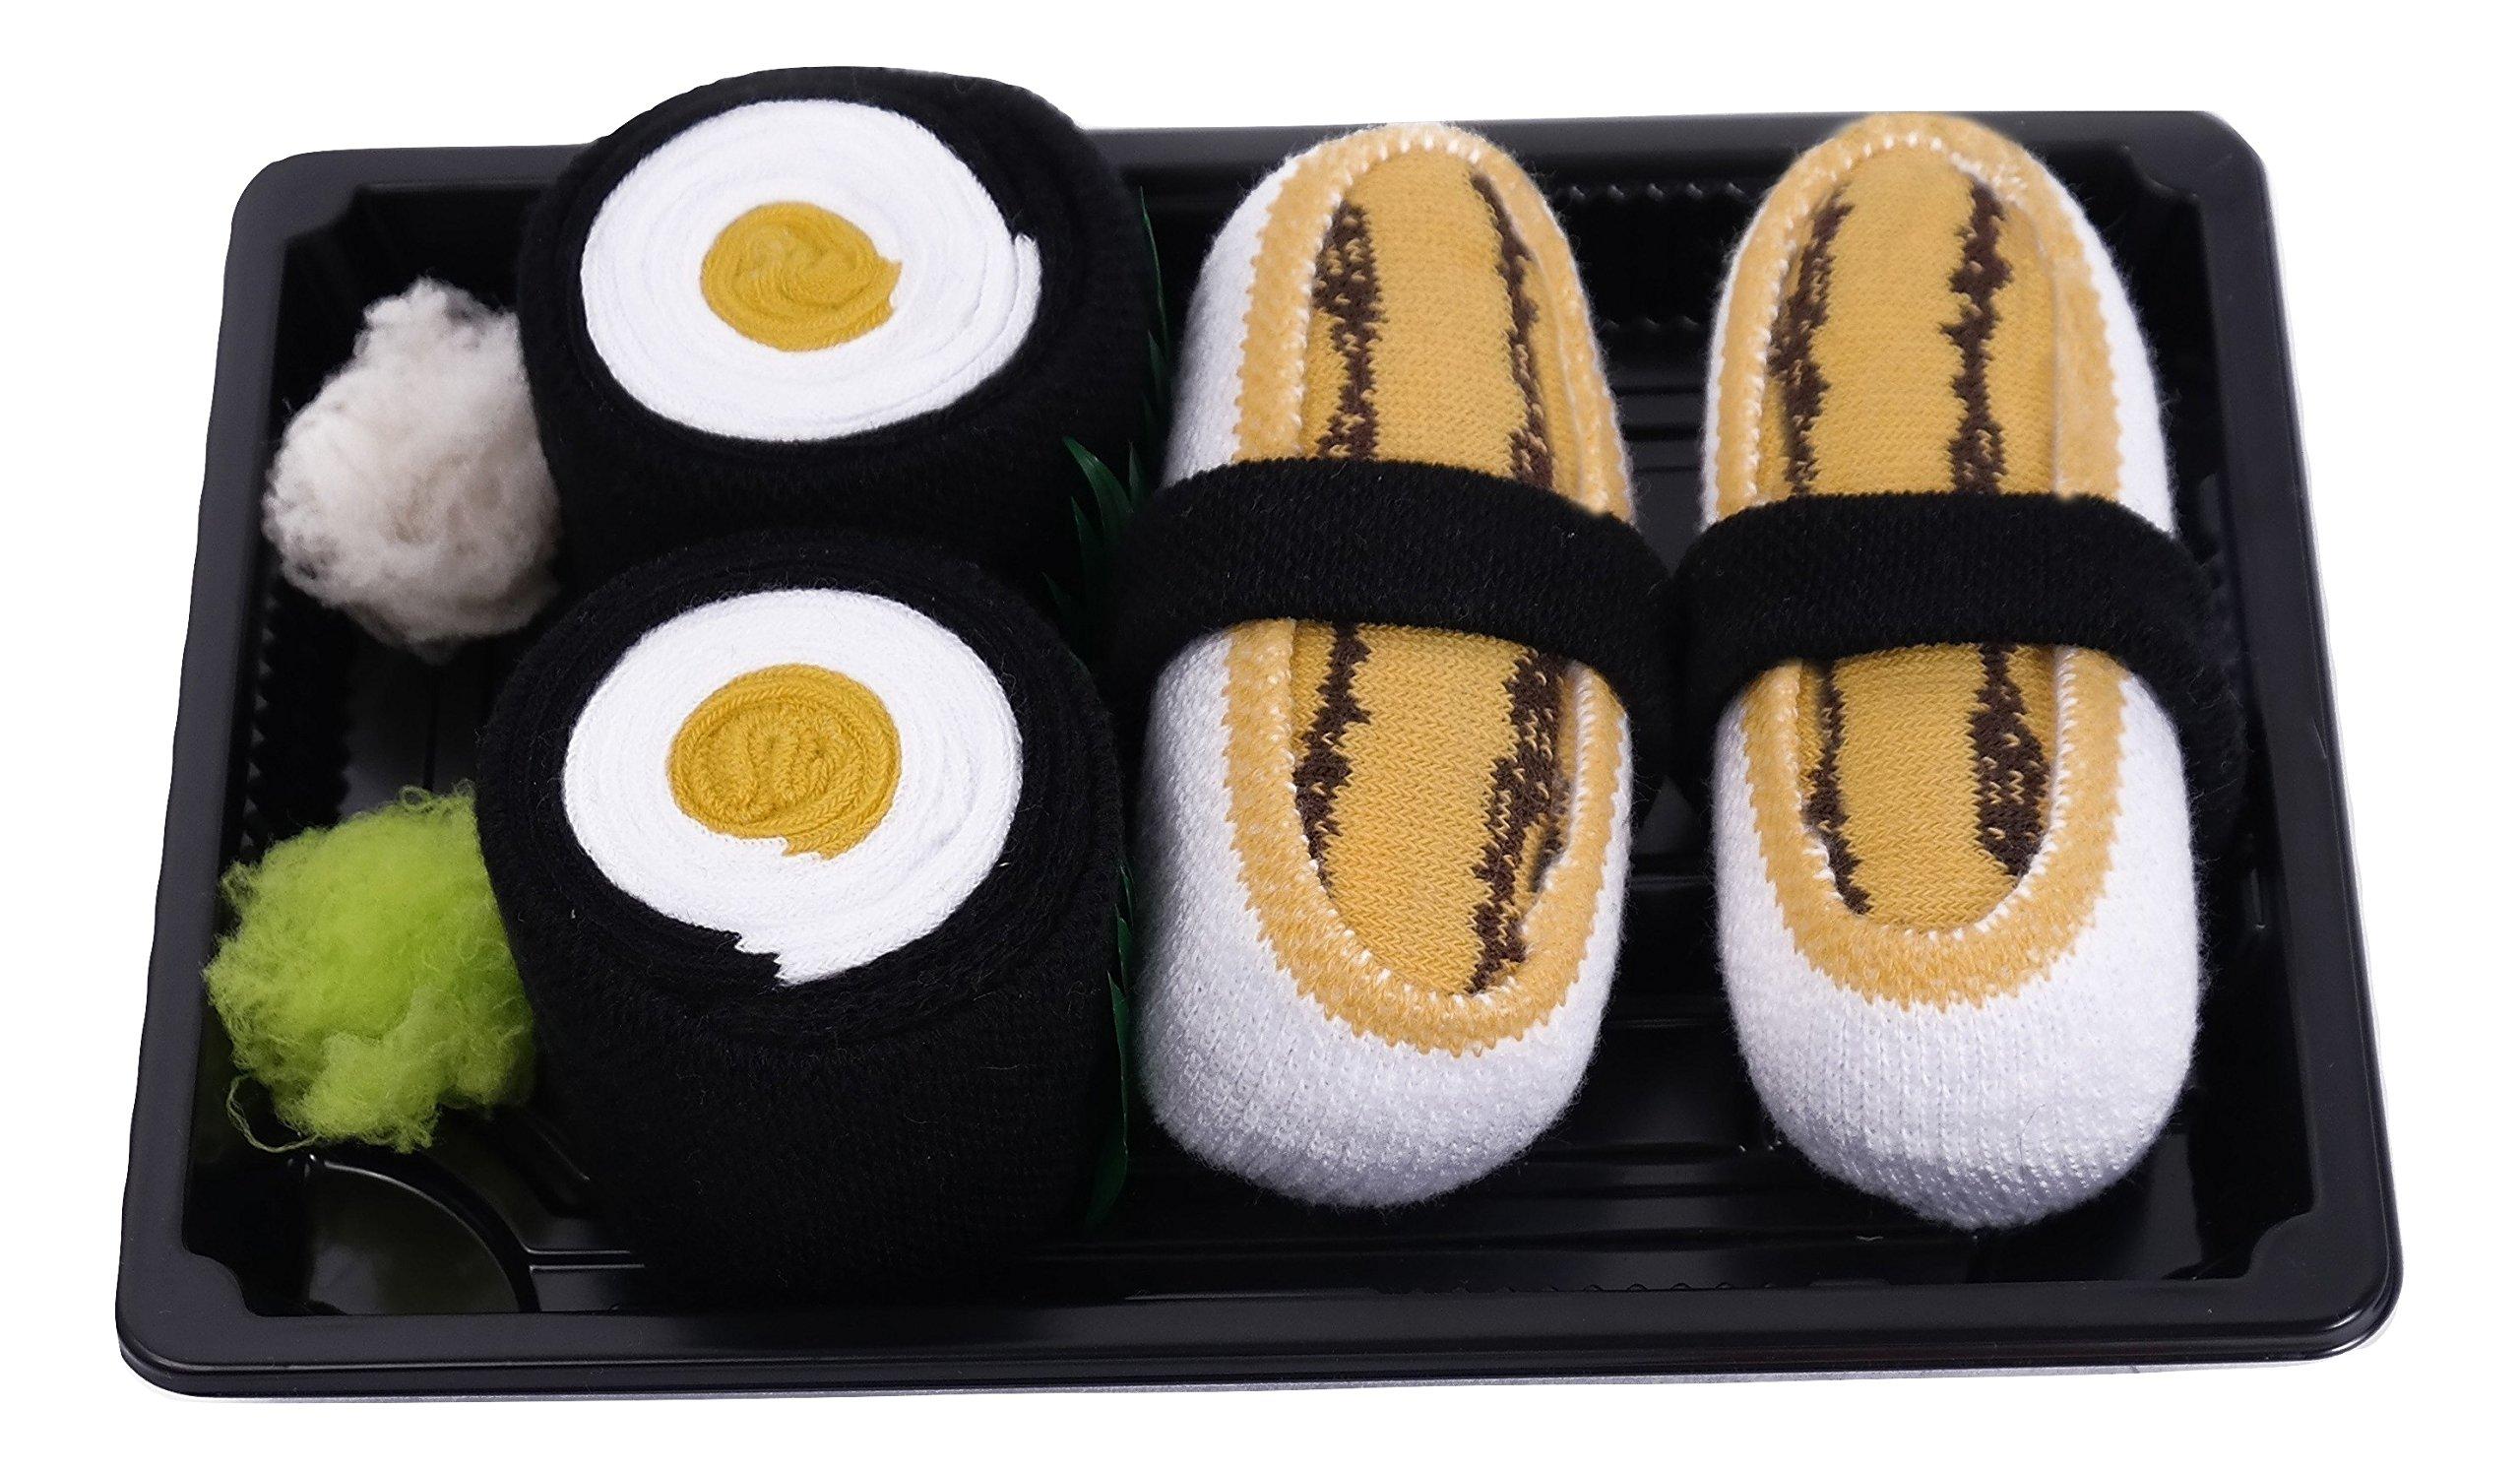 SUSHI SOCKS BOX 2 pairs Tamago Maki Oshinko Unisex FUNNY GIFT! Made in Europe L by Colors of Rainbow (Image #1)